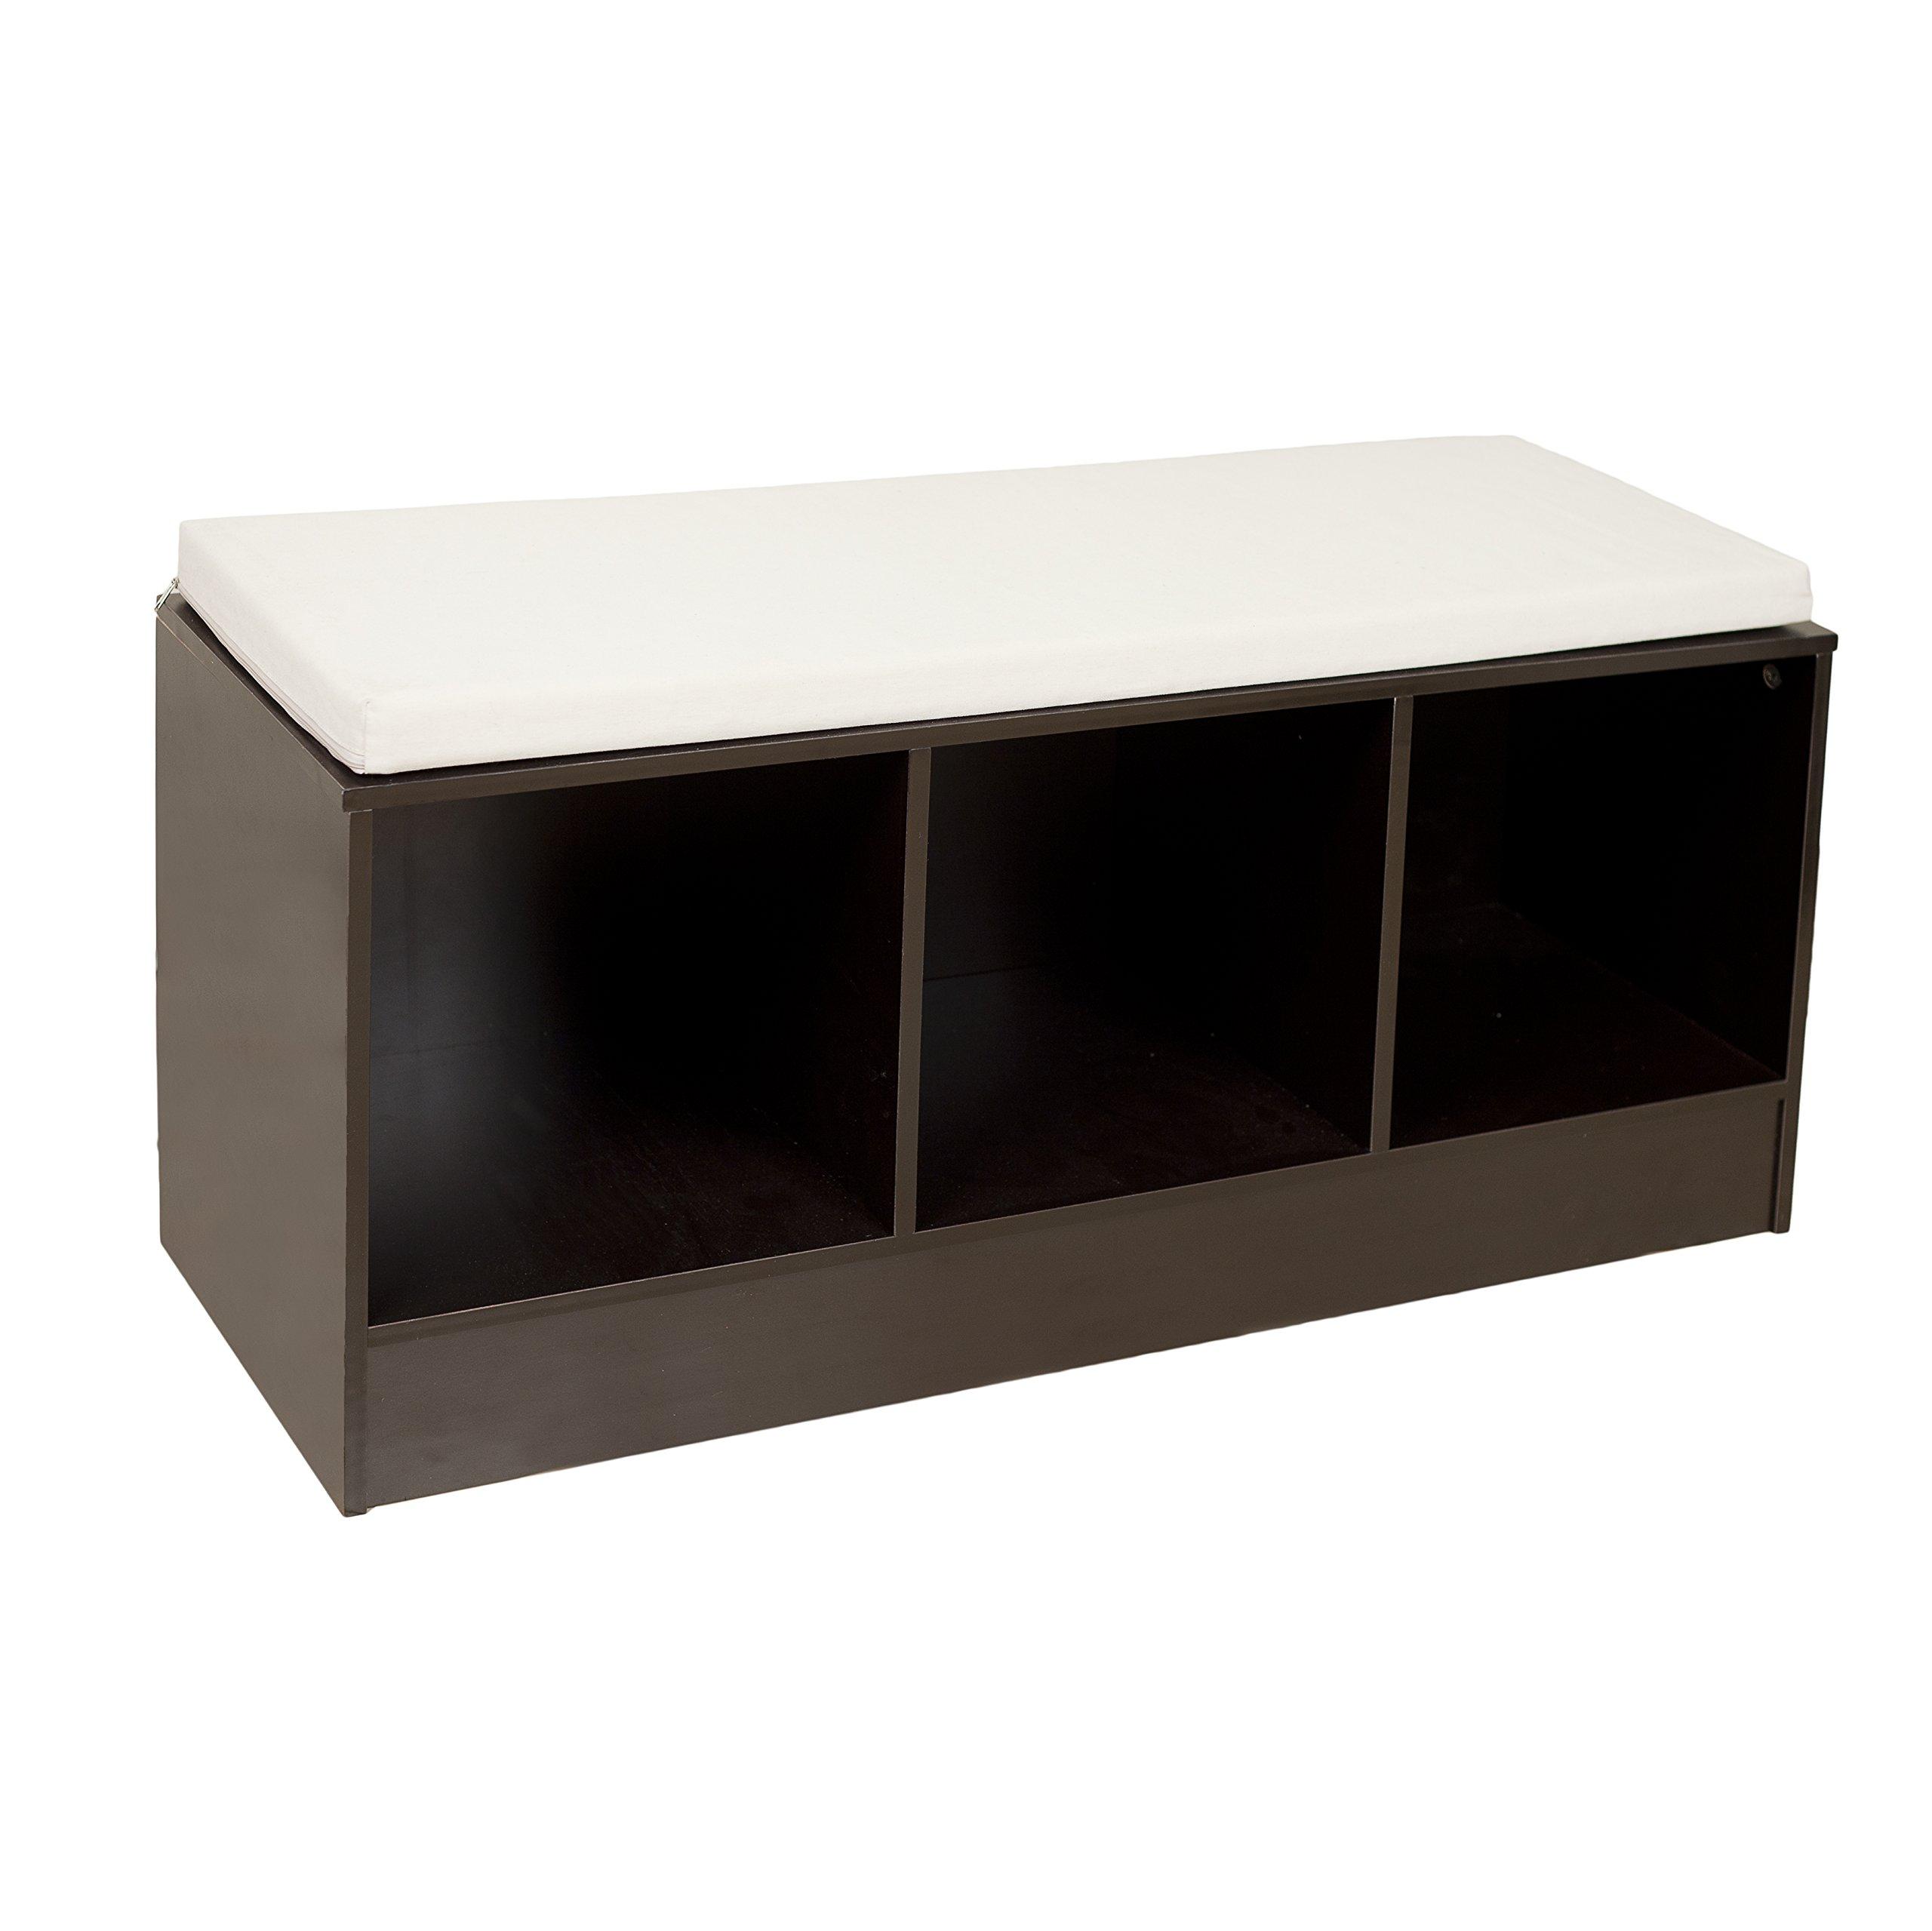 Danya B. Storage Bench with Canvas Cushion